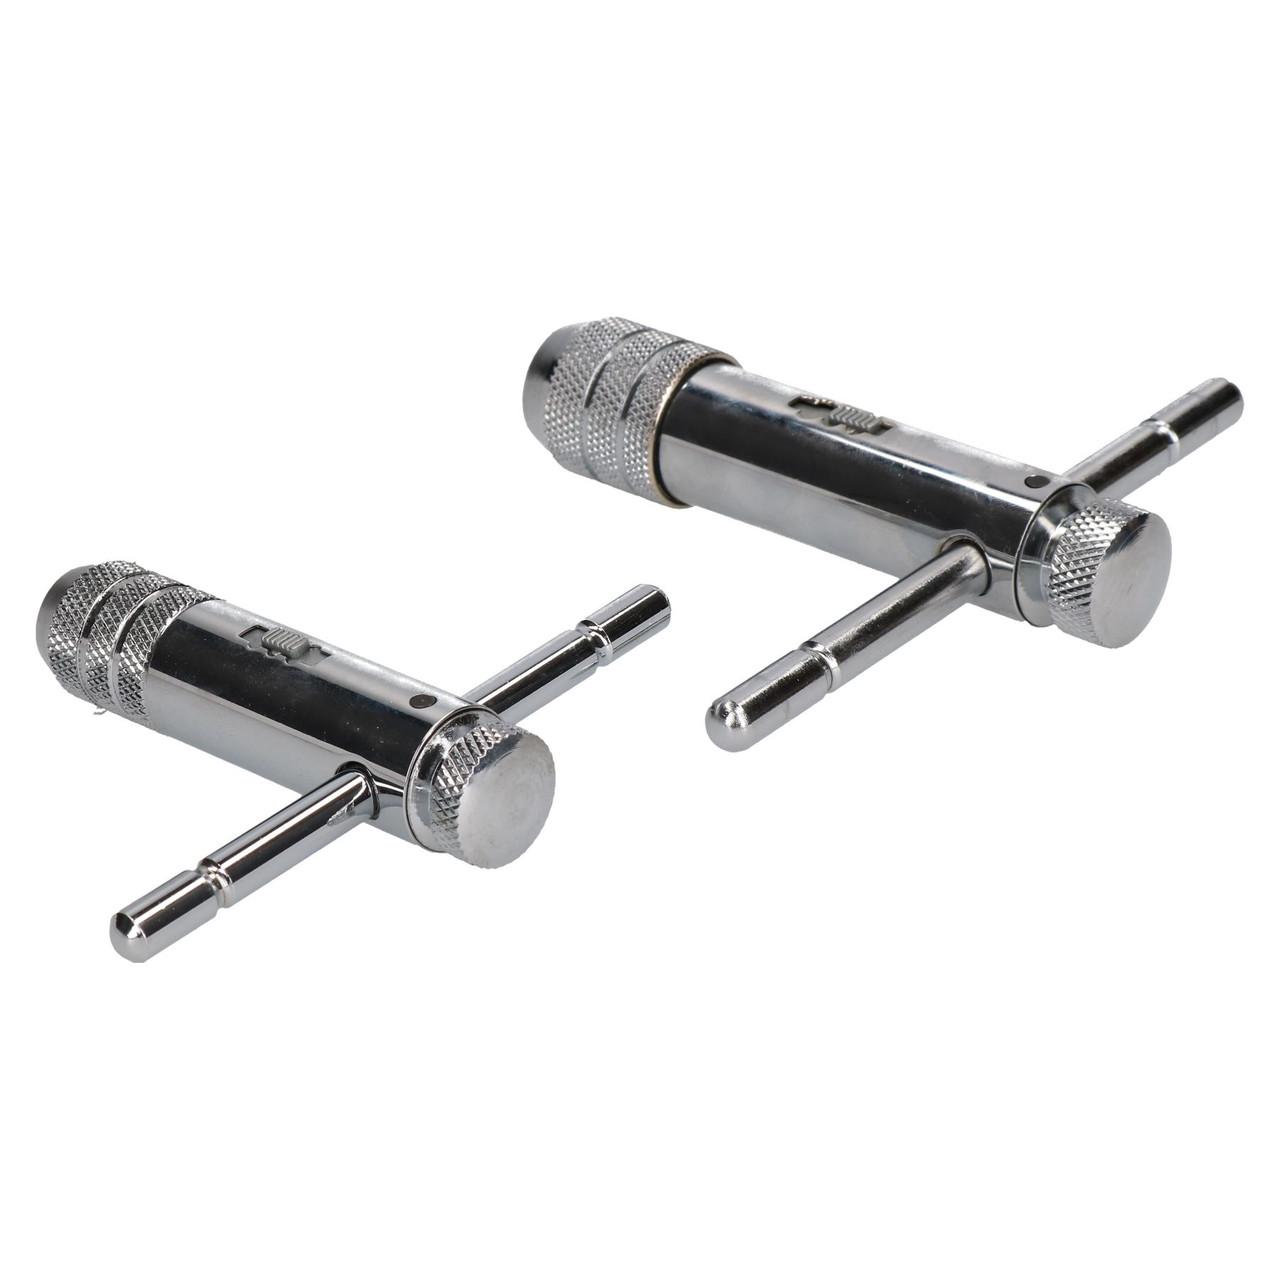 M3-M8 Ratchet Tap Wrench Holder Grip T Bar Handle Reversible TE163